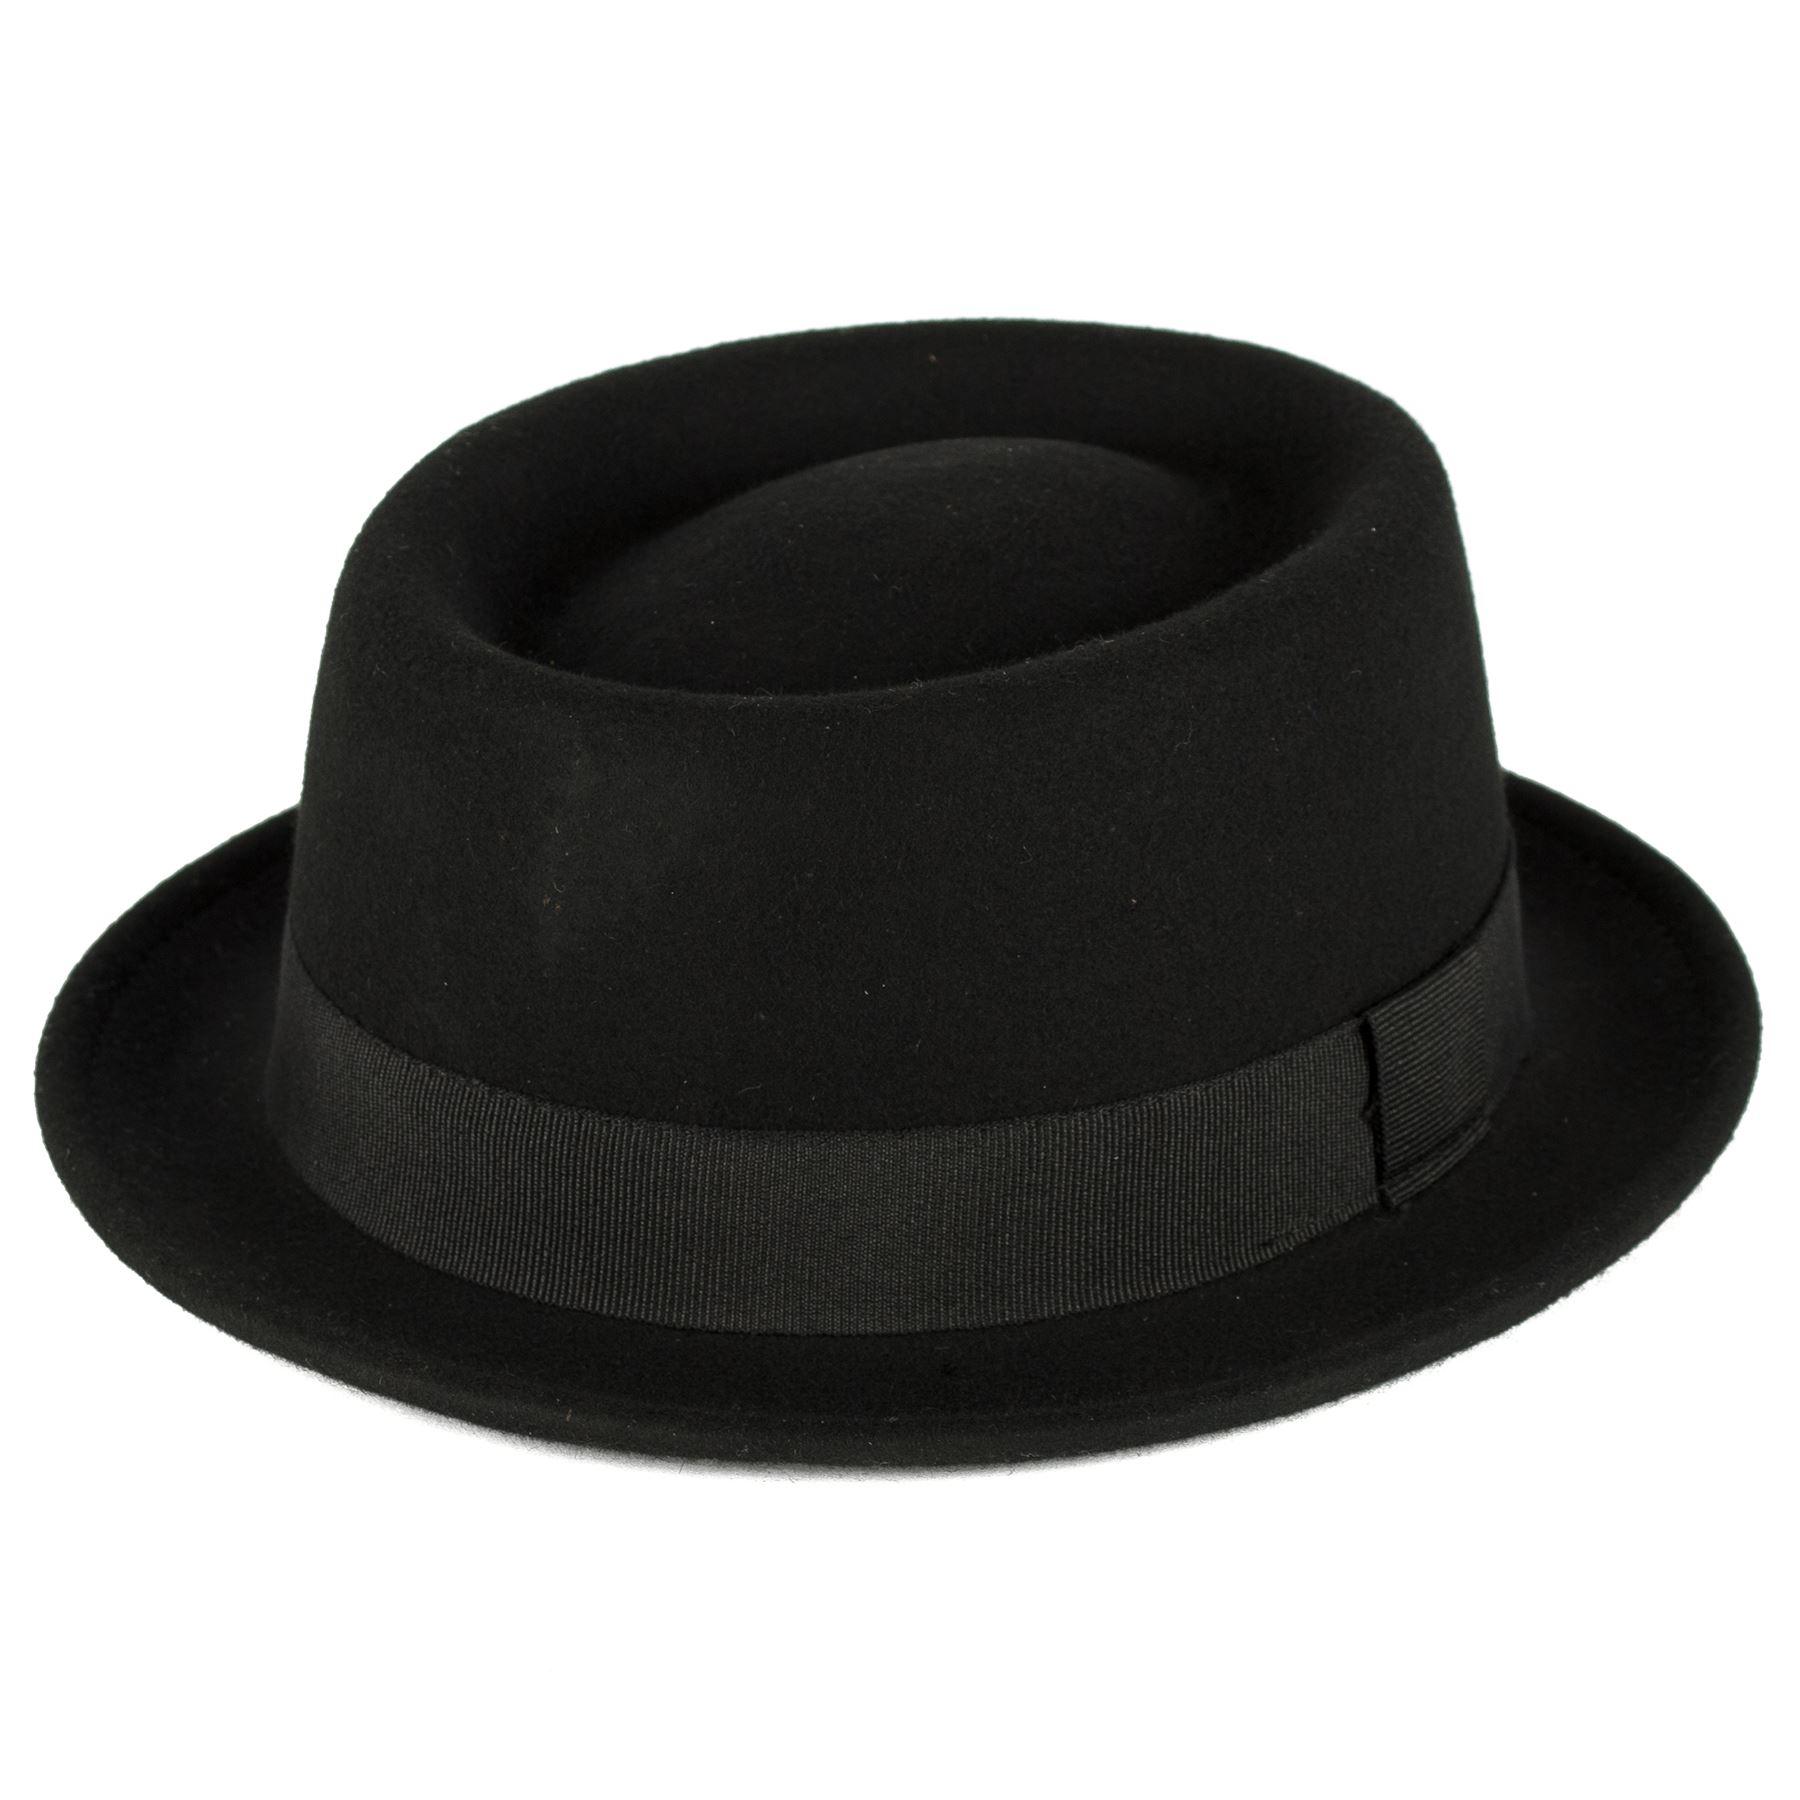 276f675197f Stylish Wool Pork Pie Hat Waterproof    Crushable